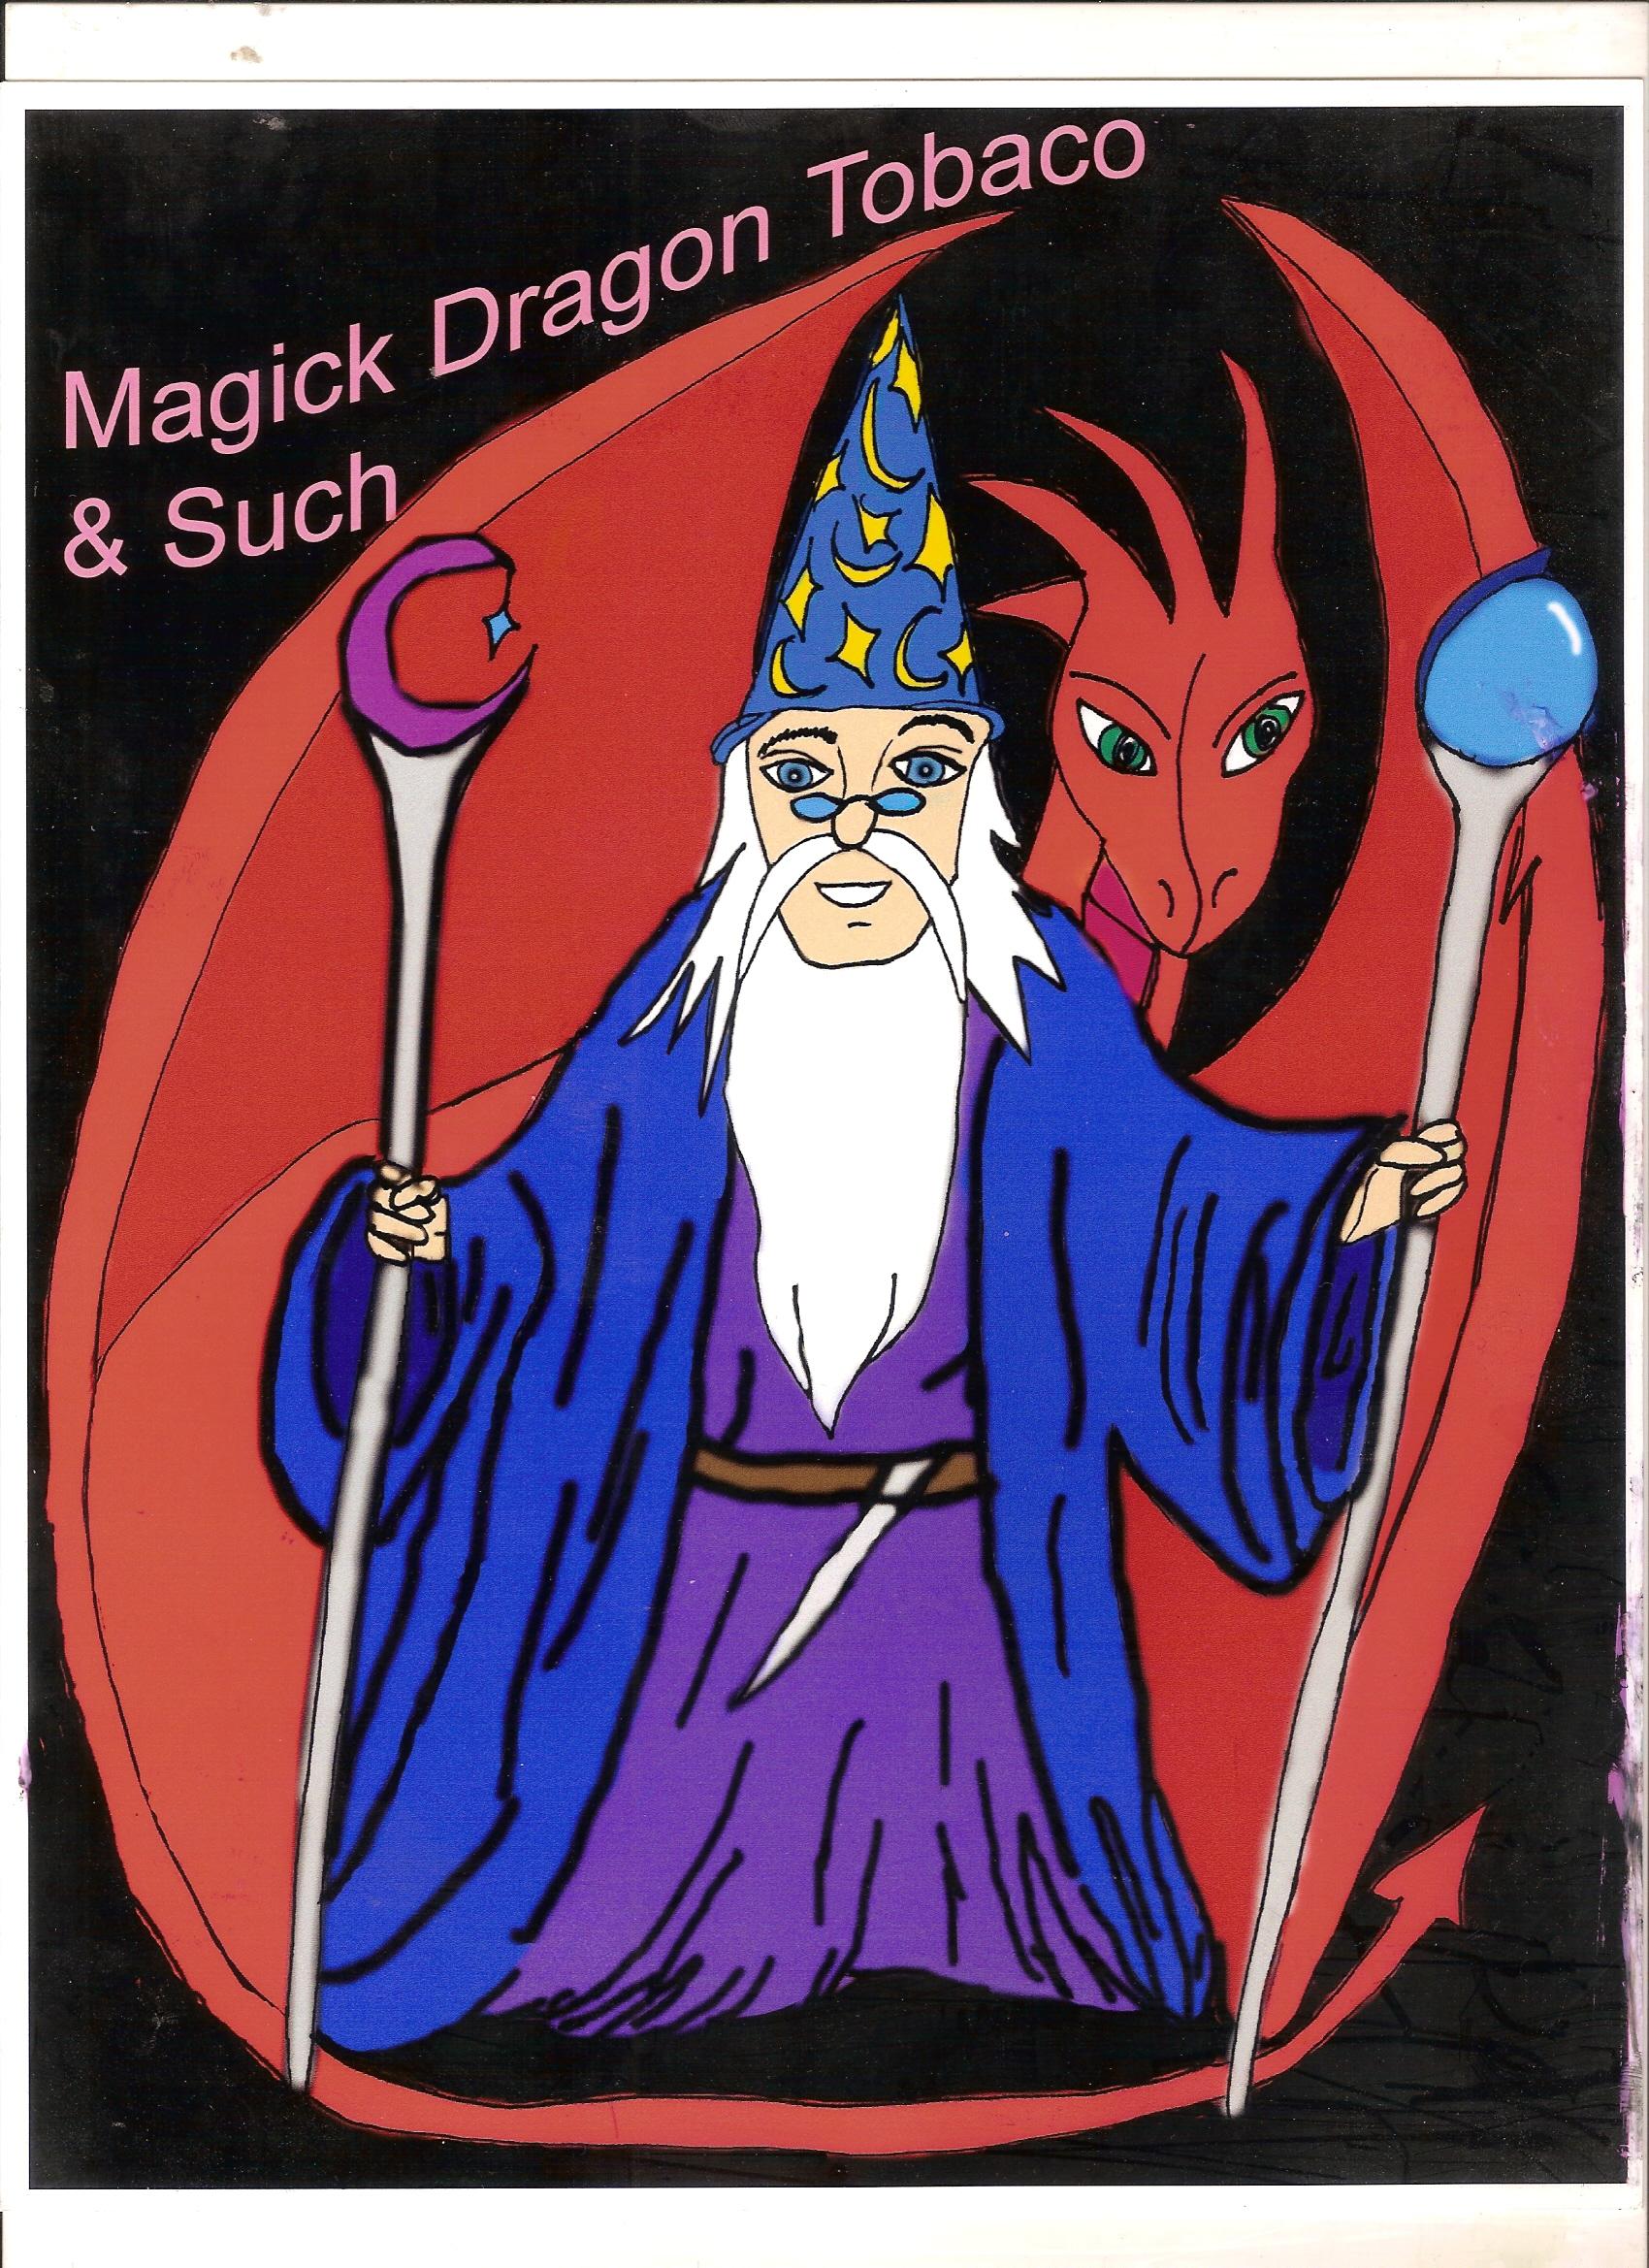 Magick Tobacco